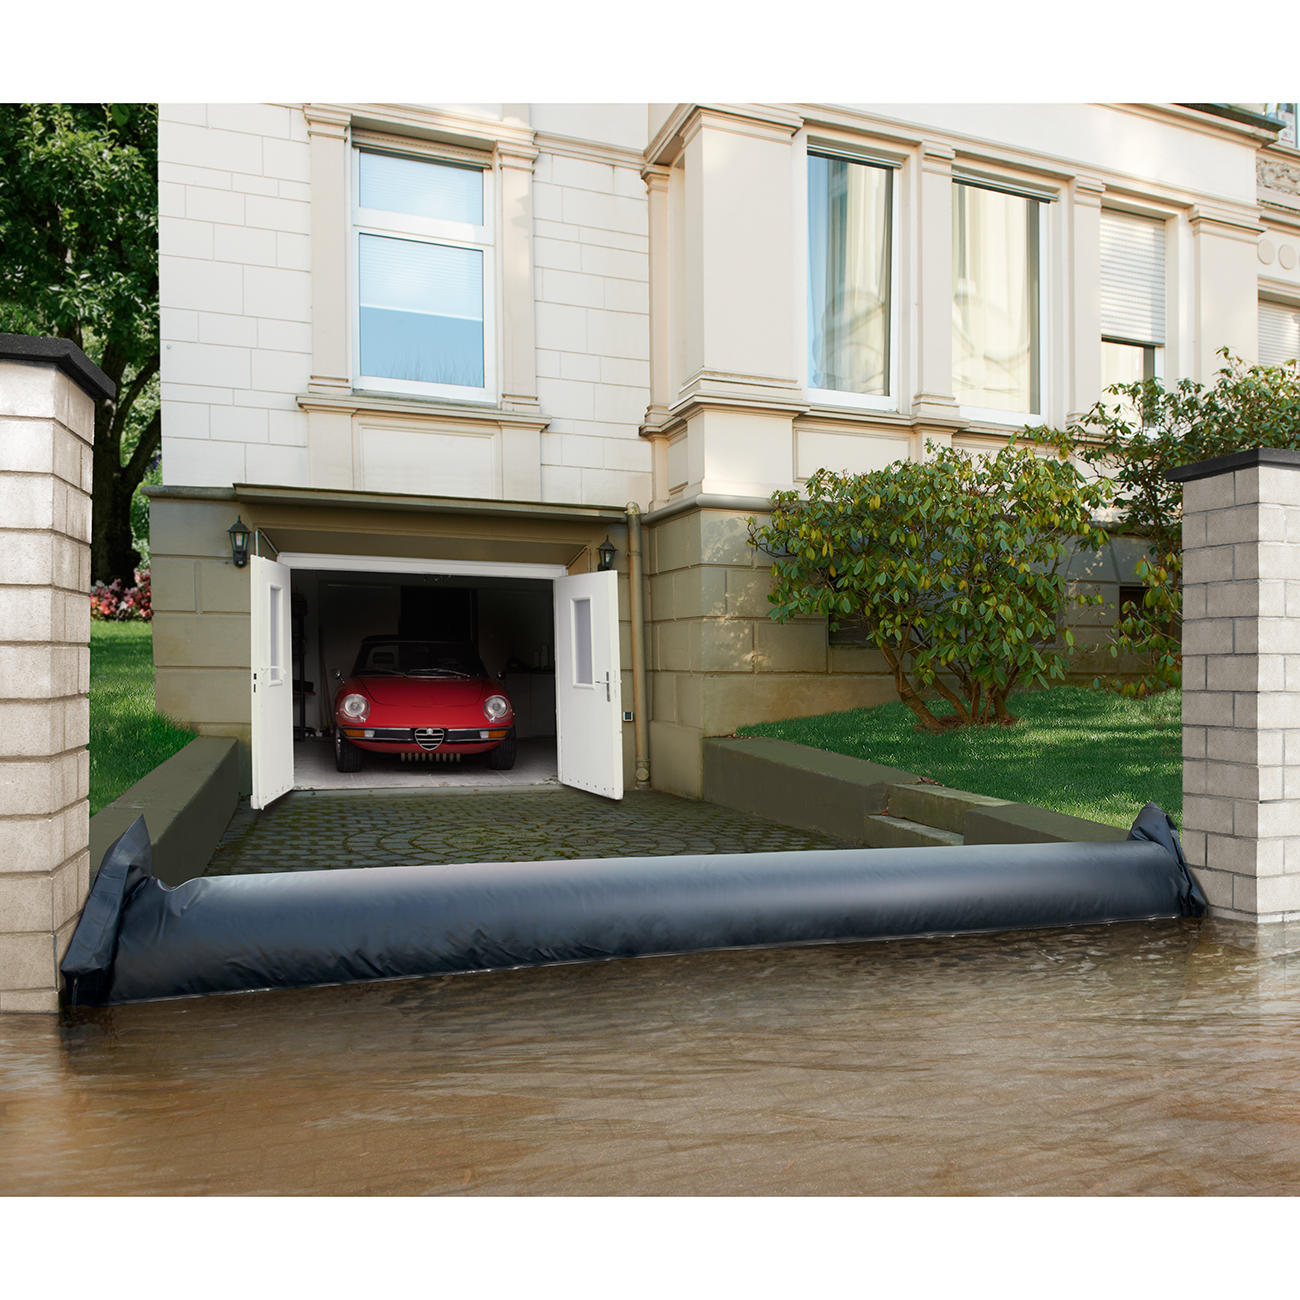 Buy Flood Defence Tube  3-Year Product Guarantee-2118